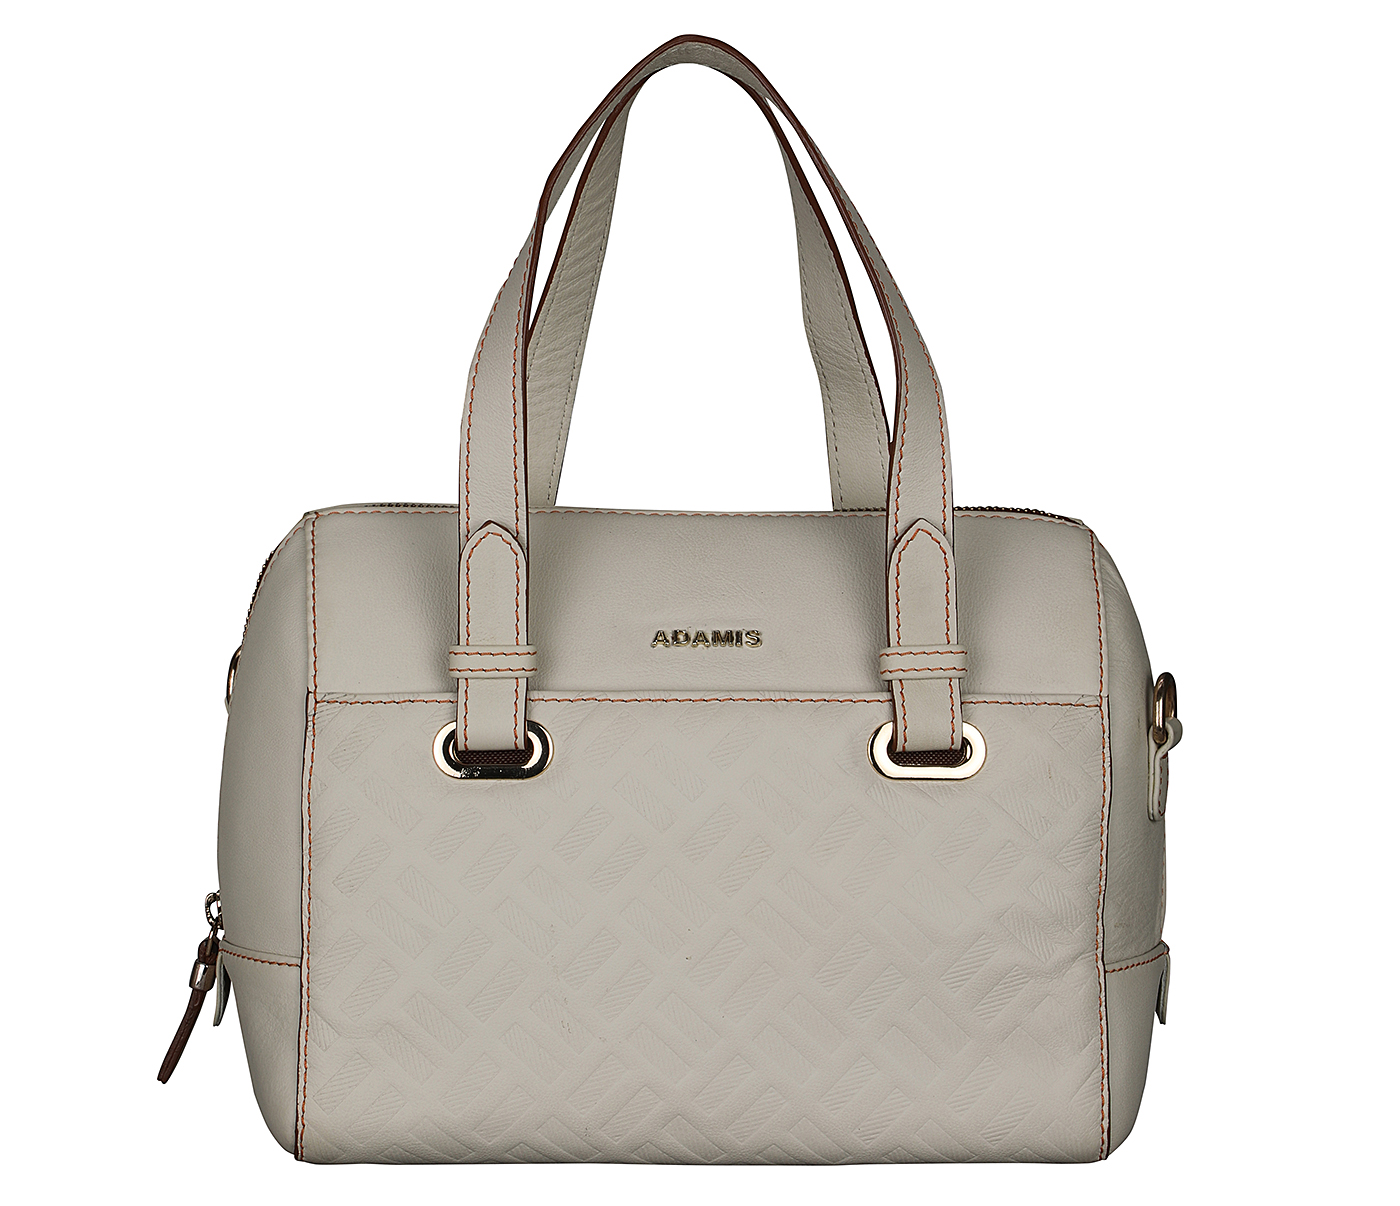 Handbag - B888